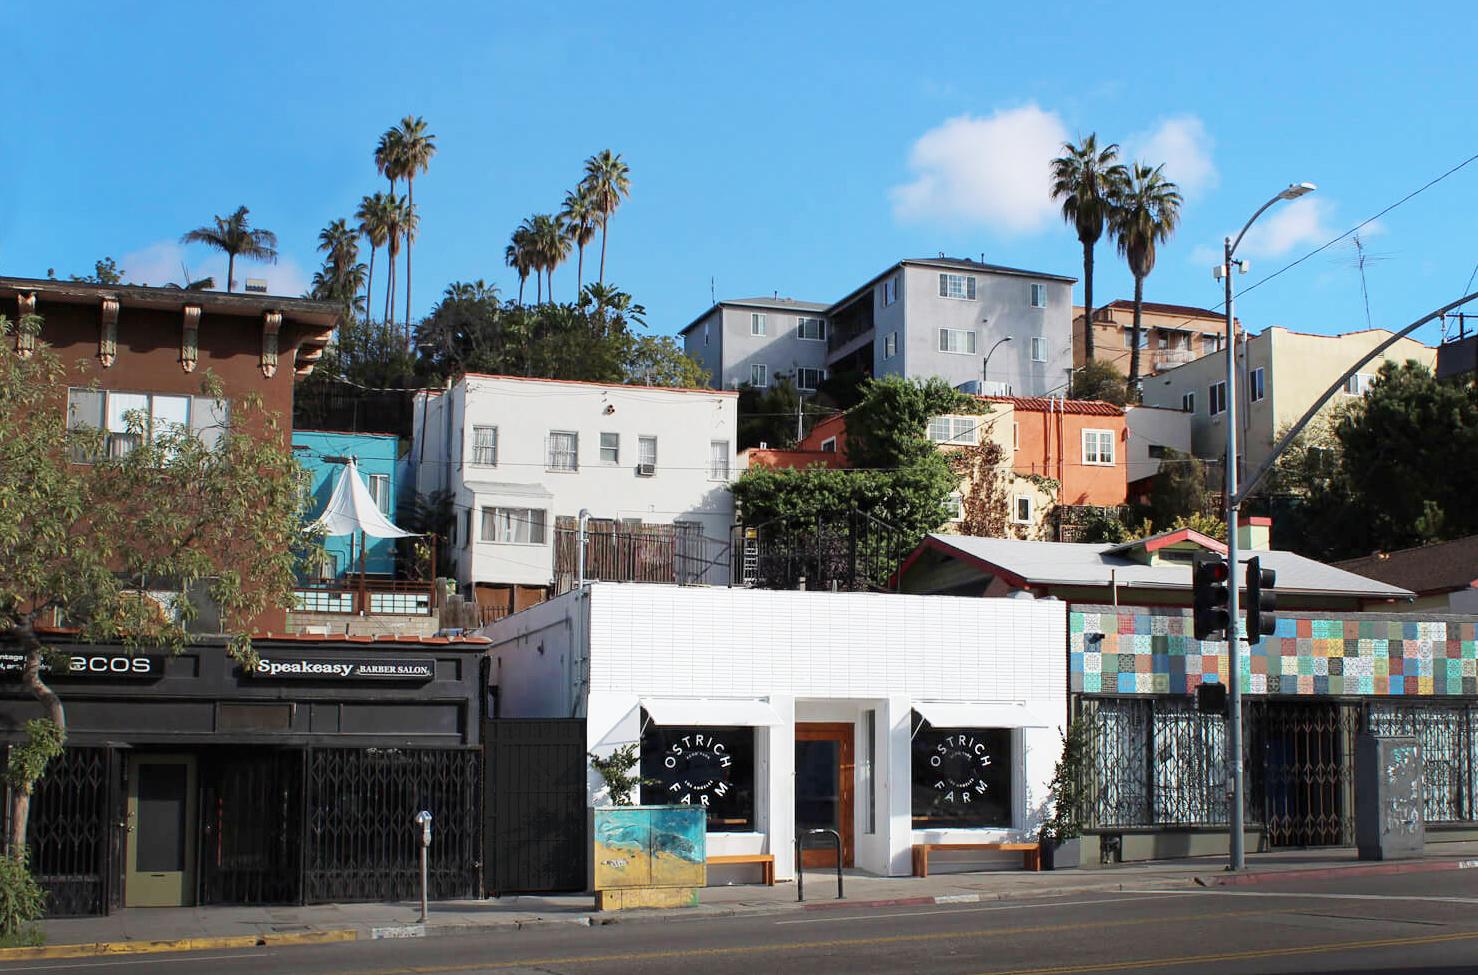 Ostrich Farm Restaurant Los Angeles